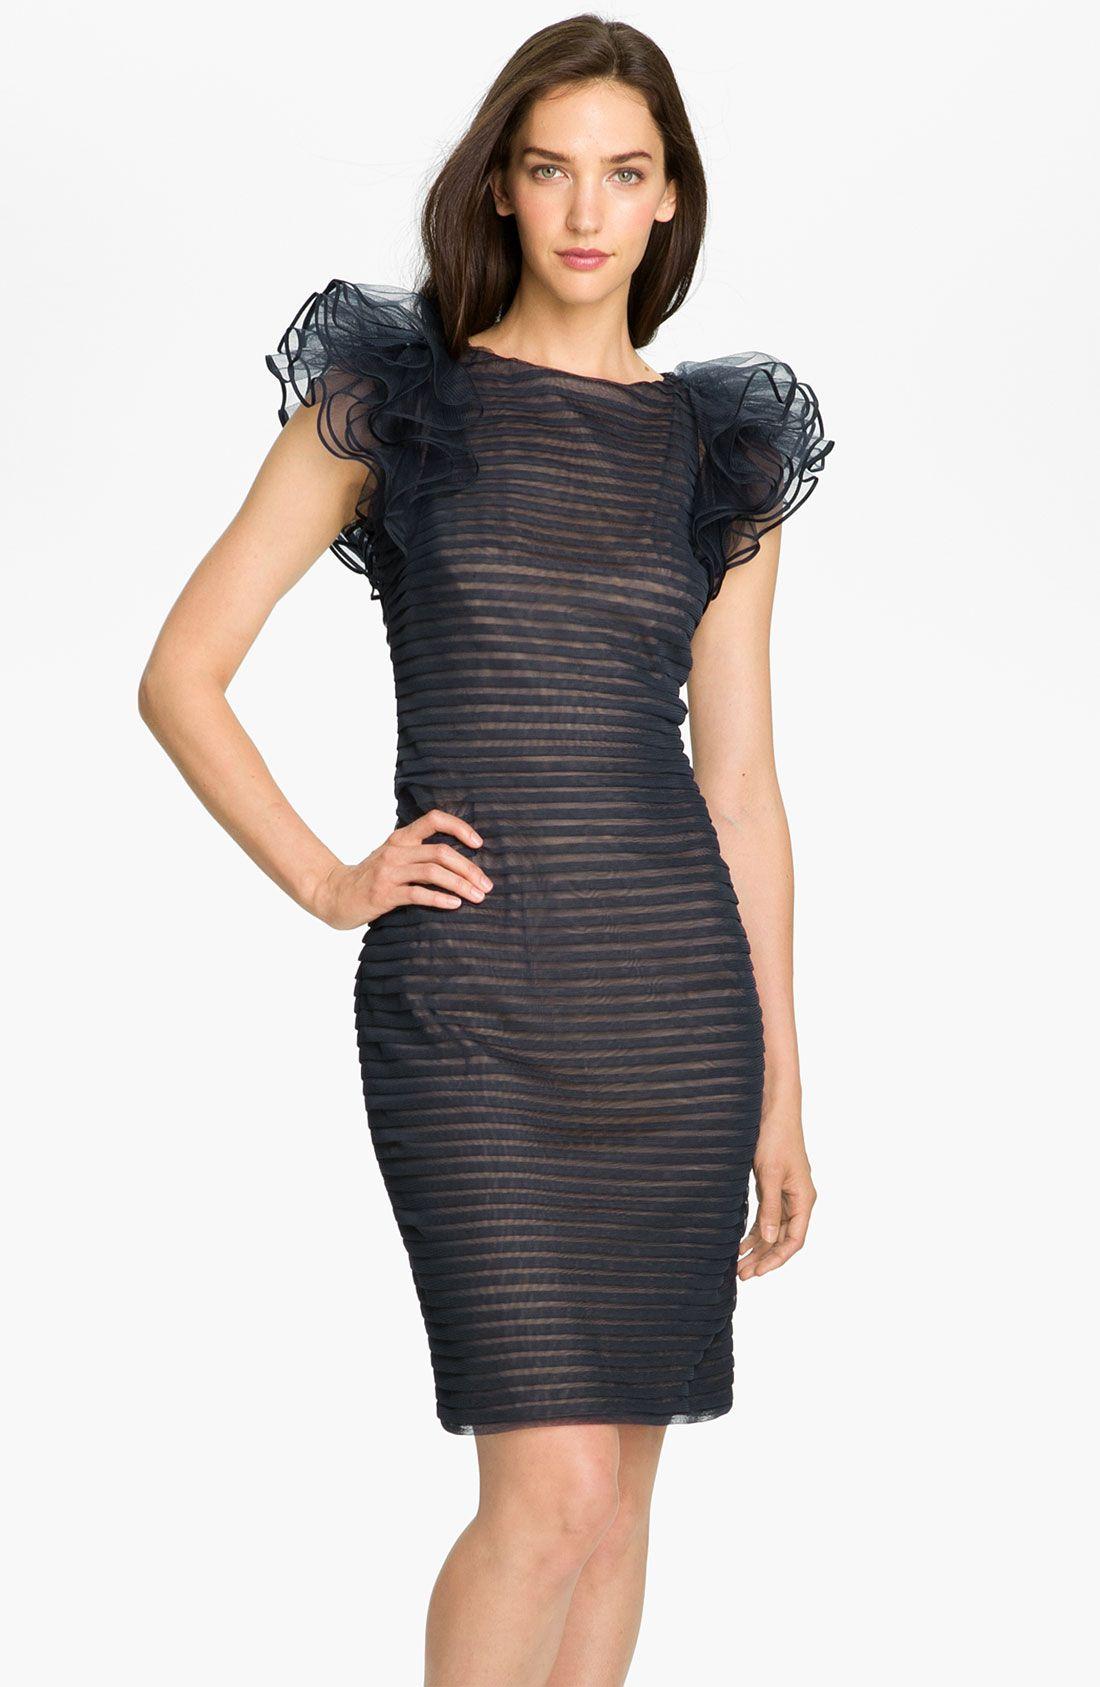 Little Black Dress With Fluffy Cap Sleeves Tadashi Shoji Dresses Mesh Dress Nordstrom Dresses [ 1687 x 1100 Pixel ]